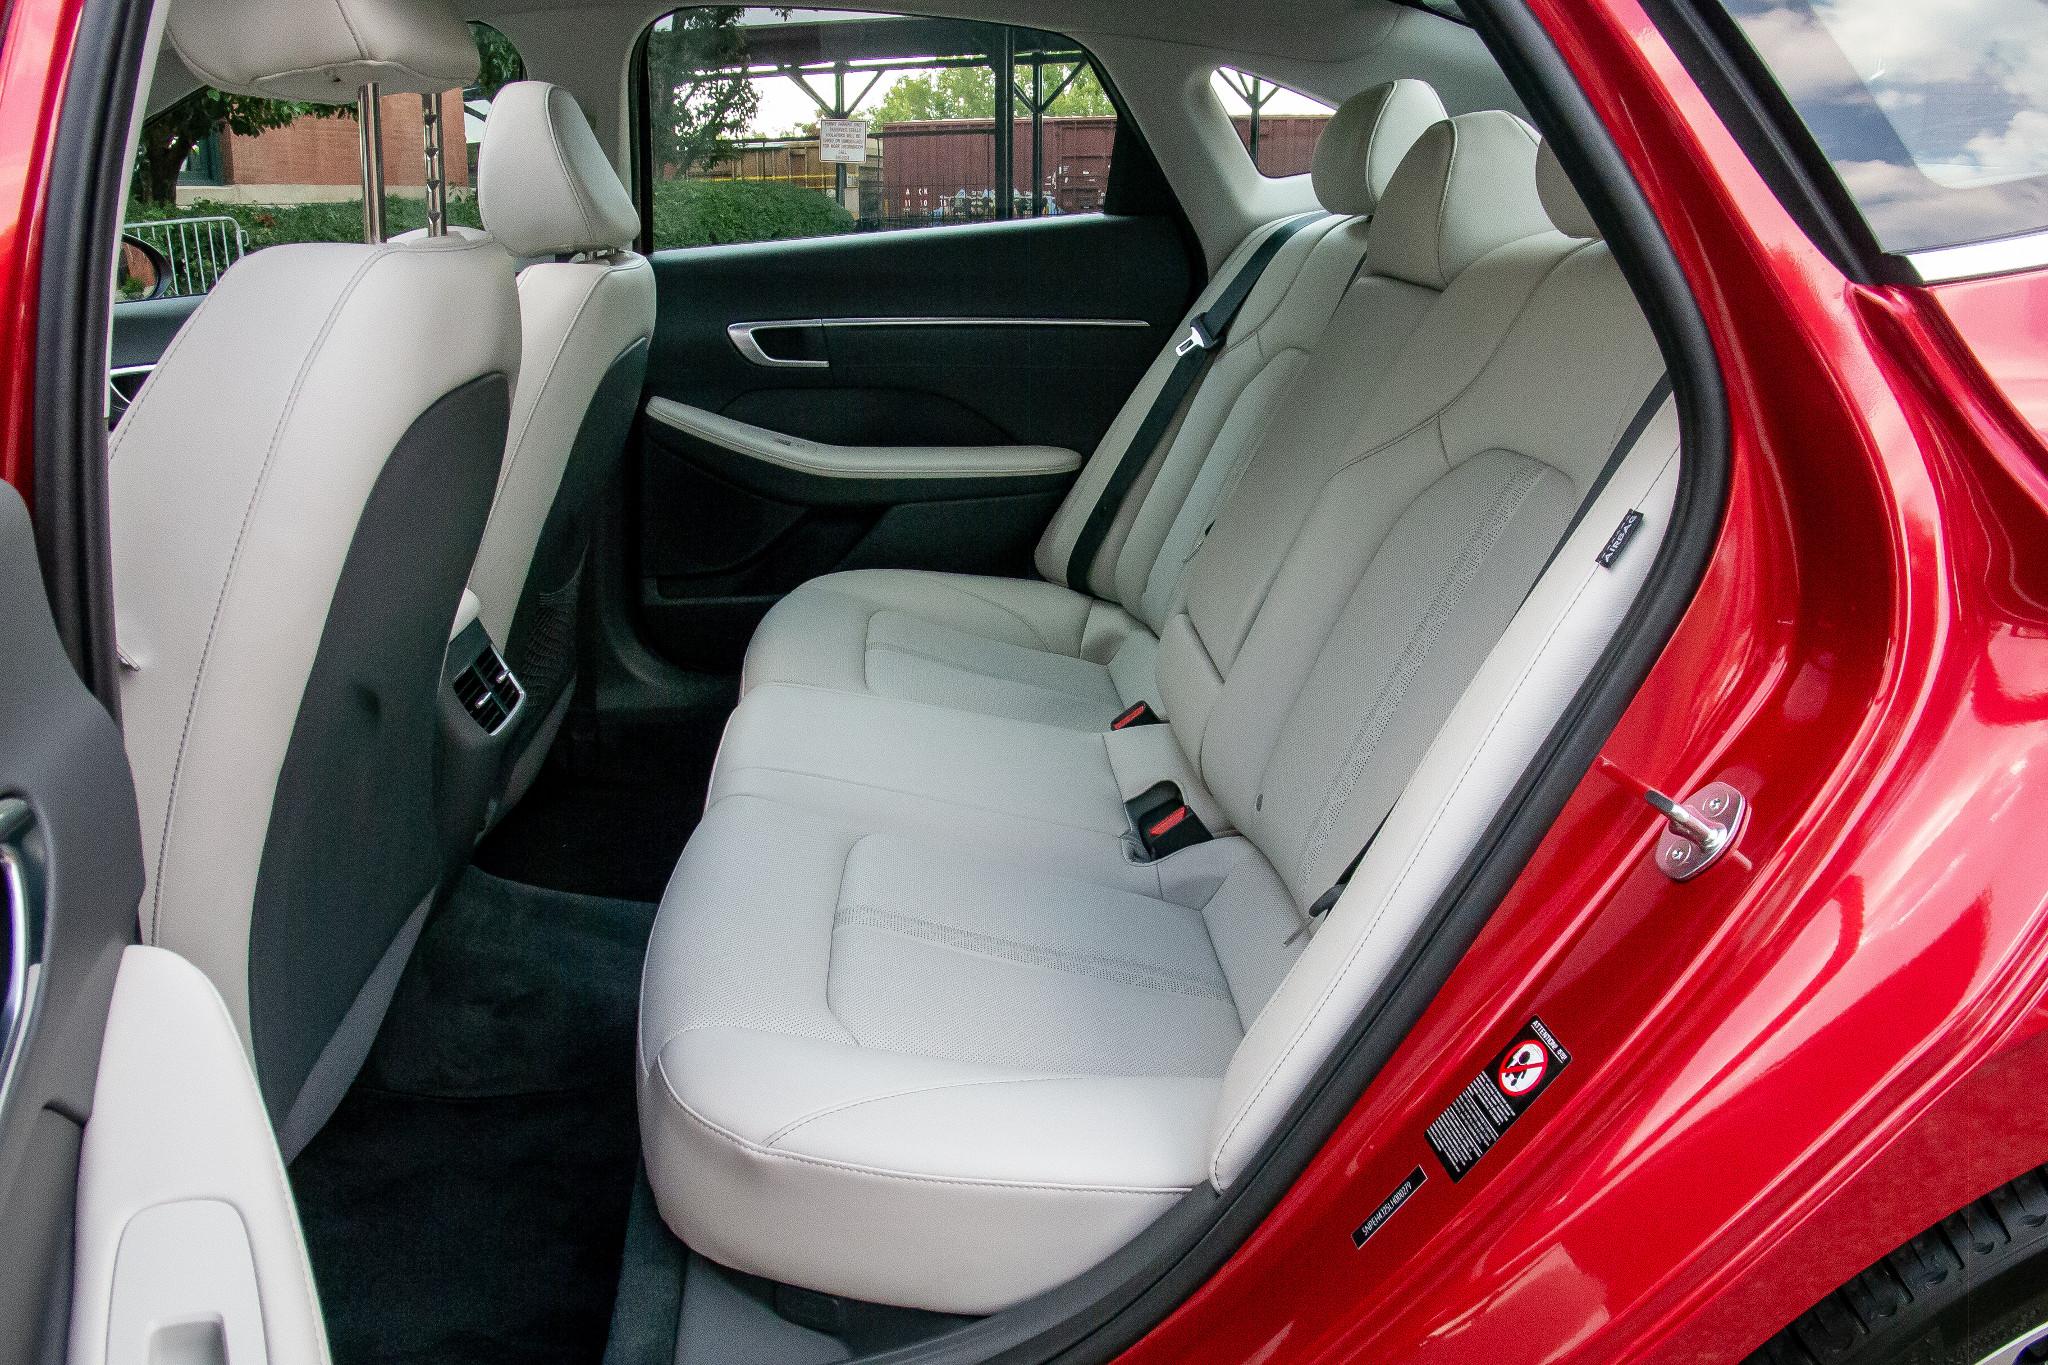 hyundai-sonata-2020-interior--rear-seats-28.jpg